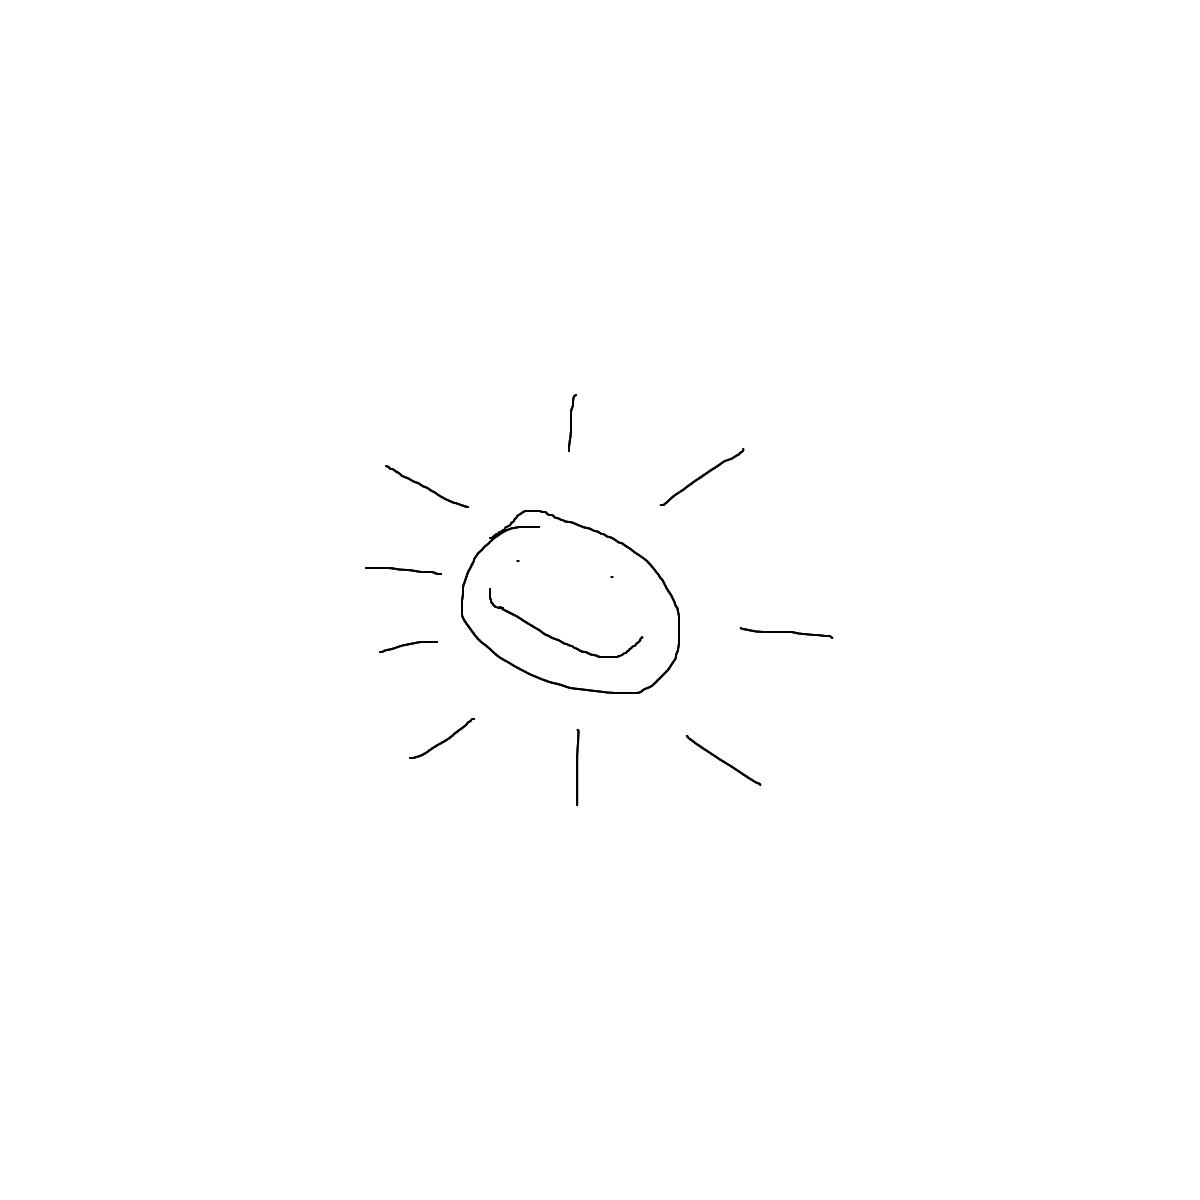 BAAAM drawing#5319 lat:38.2910232543945300lng: 21.7740631103515620